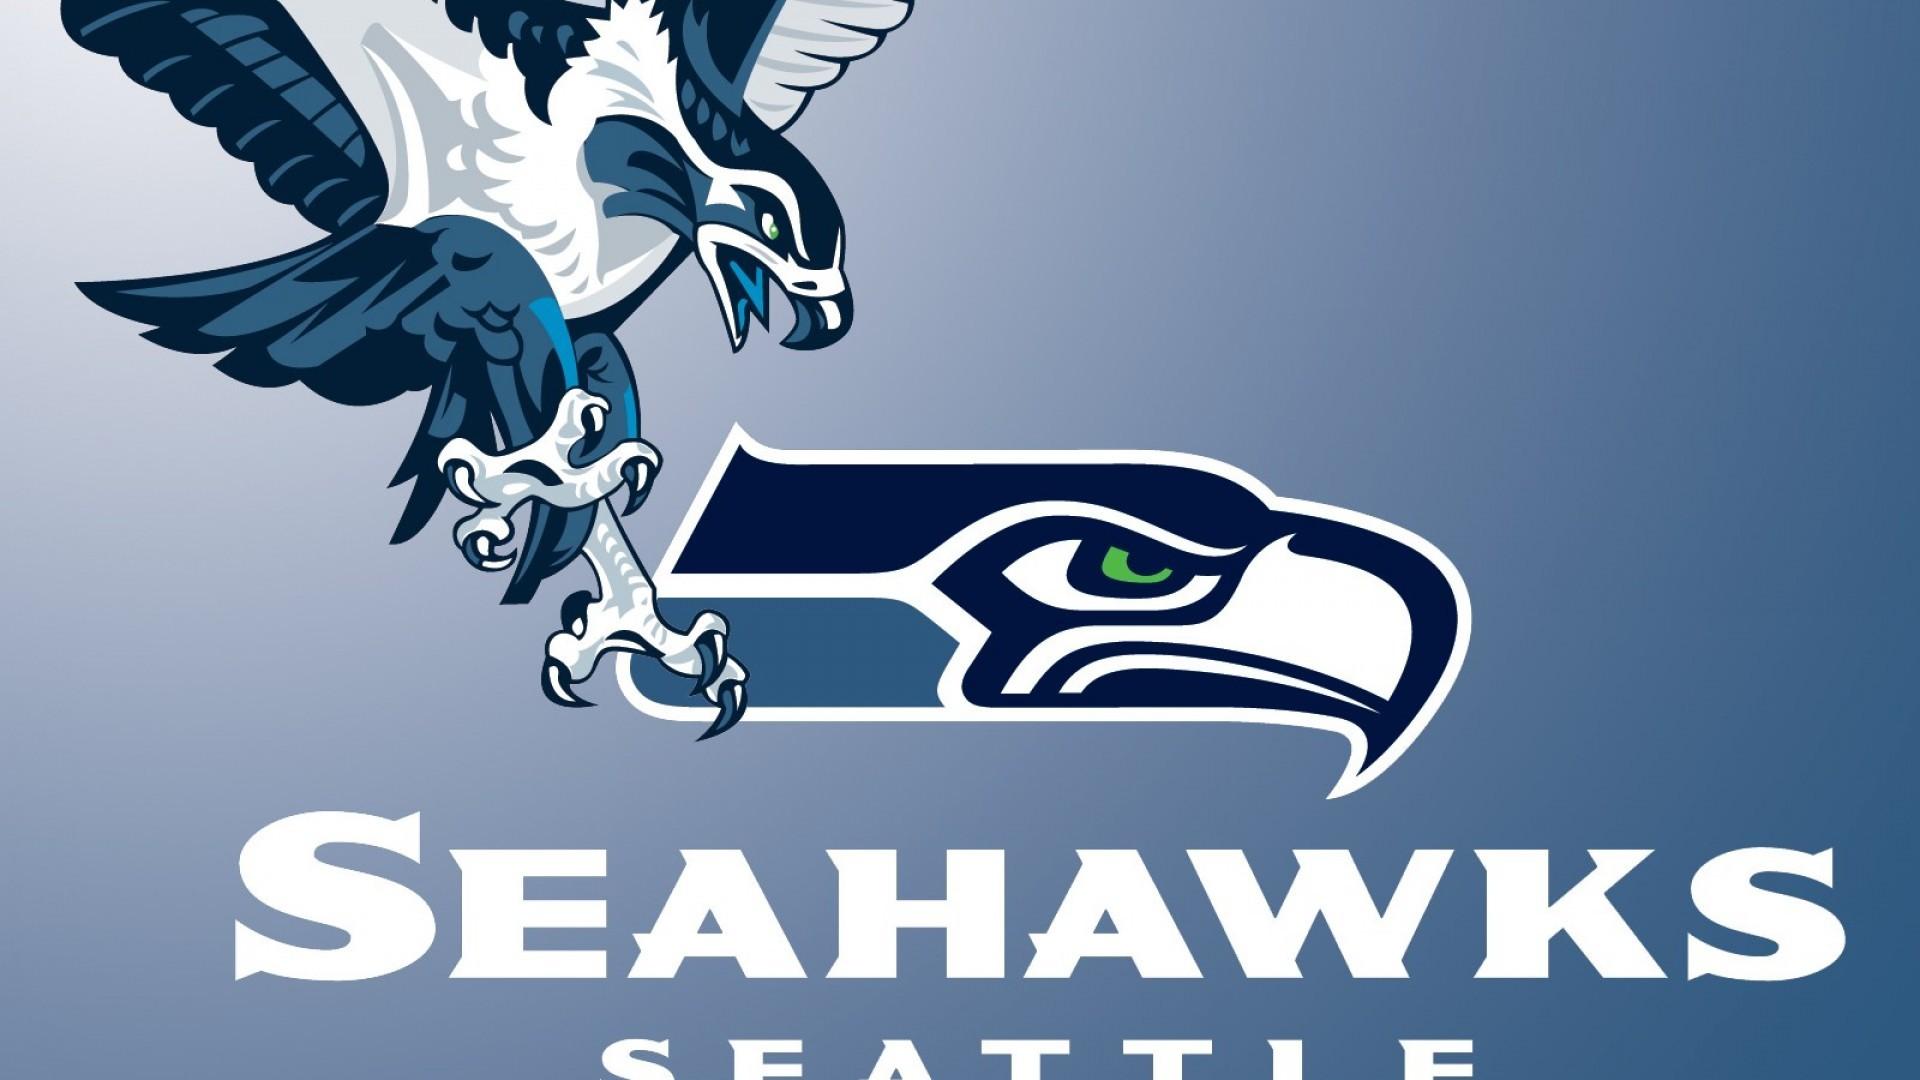 Seahawks – NFL Backgrounds :: Full (1080p) & Ultra HD .